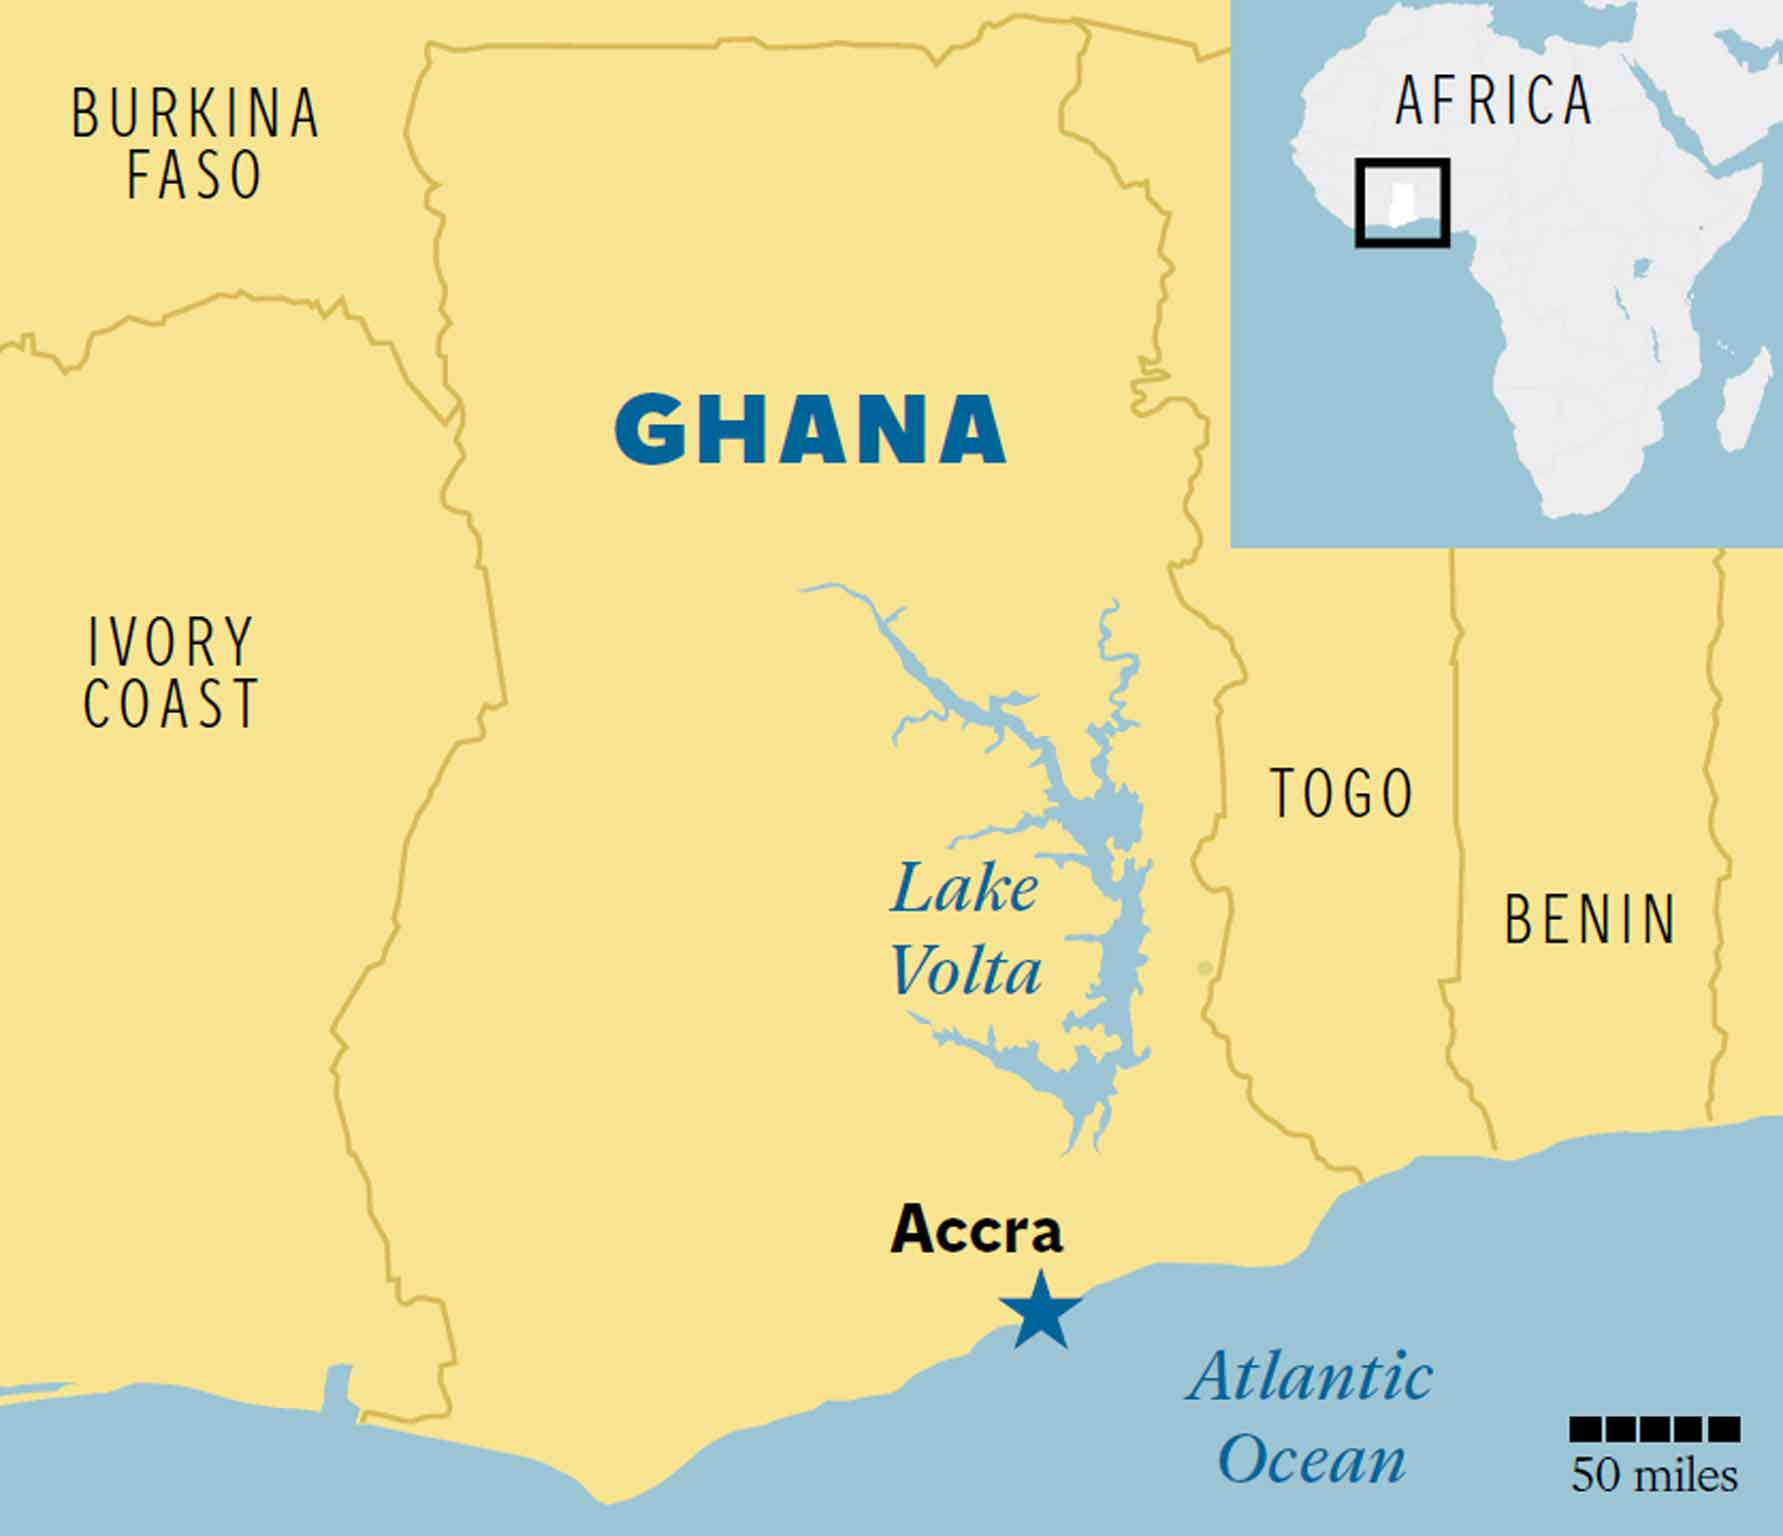 Ghana's new creative scene: Stylish new places to eat, drink ... on khartoum sudan map, addis ababa map, nairobi kenya map, ghana world map, greater accra map, ghana street map, osu ghana map, malabo equatorial guinea map, legon ghana map, kampala-uganda map, grand trunk road india map, lagos nigeria map, ethiopia yemen map, ghana flag map, cape town south africa map, ghana geological map, west africa map, abidjan ivory coast map, tripoli libya map,